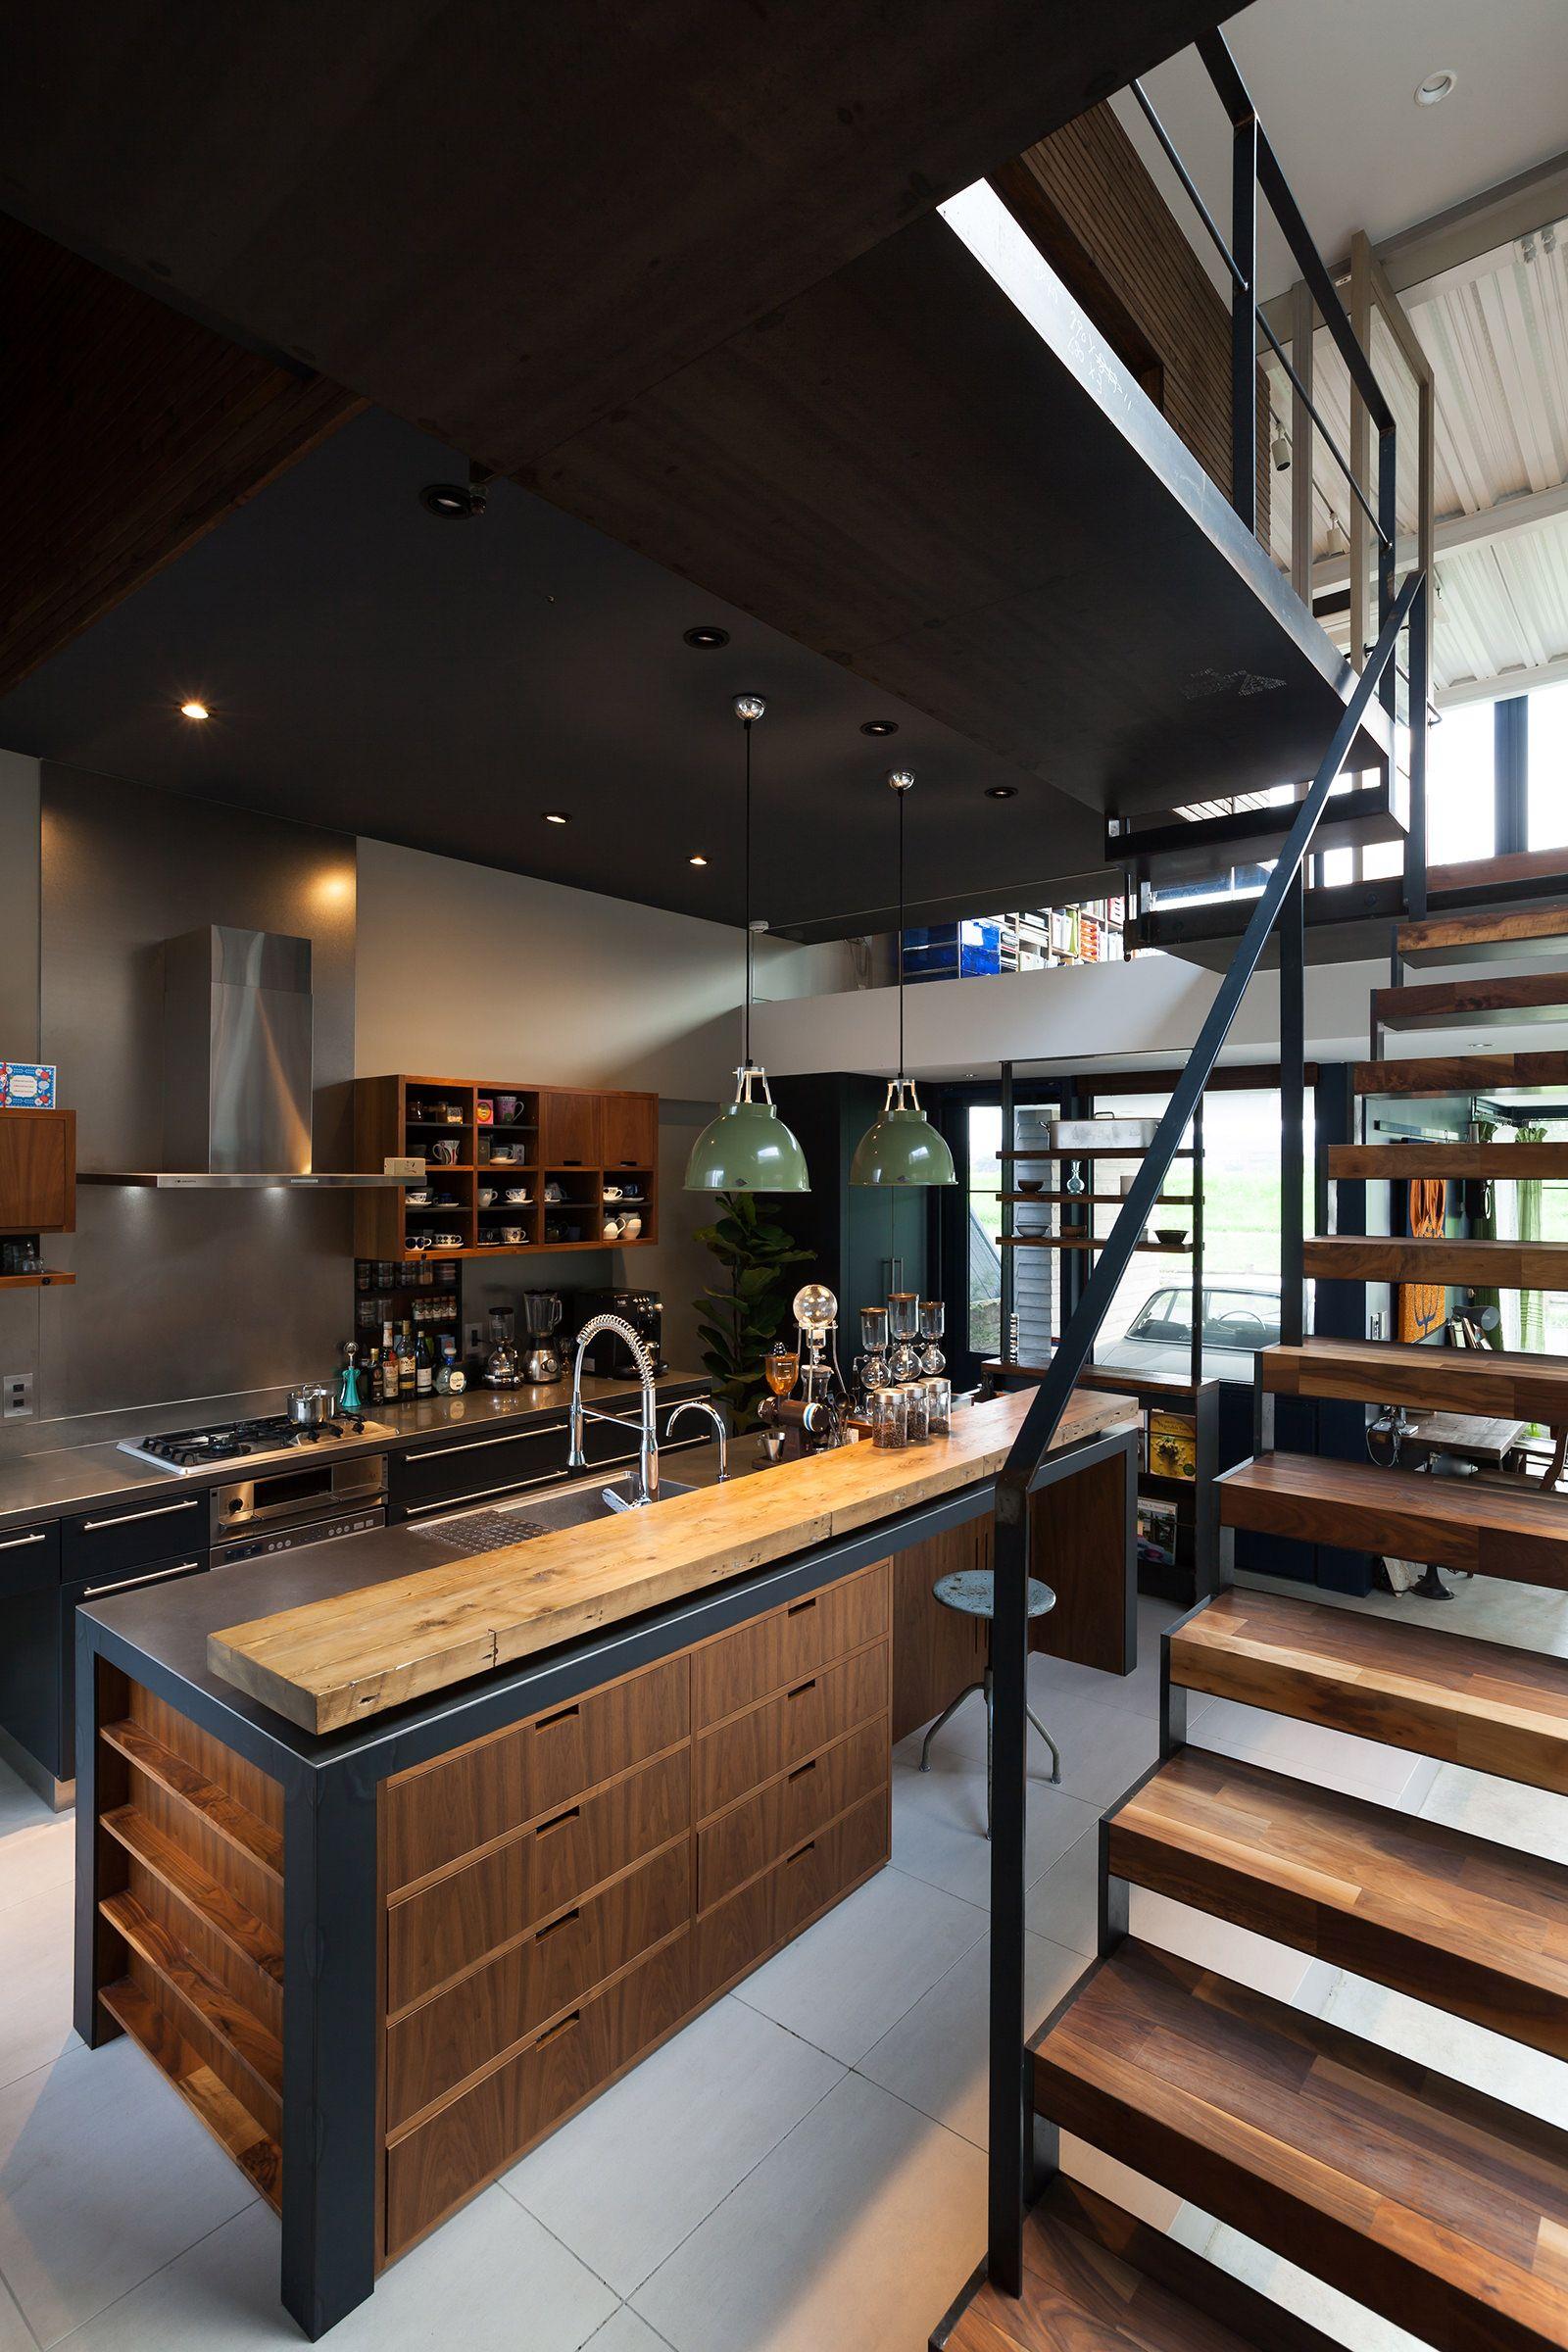 Cool Kitchen Design But Preferably A Different Colour Wood